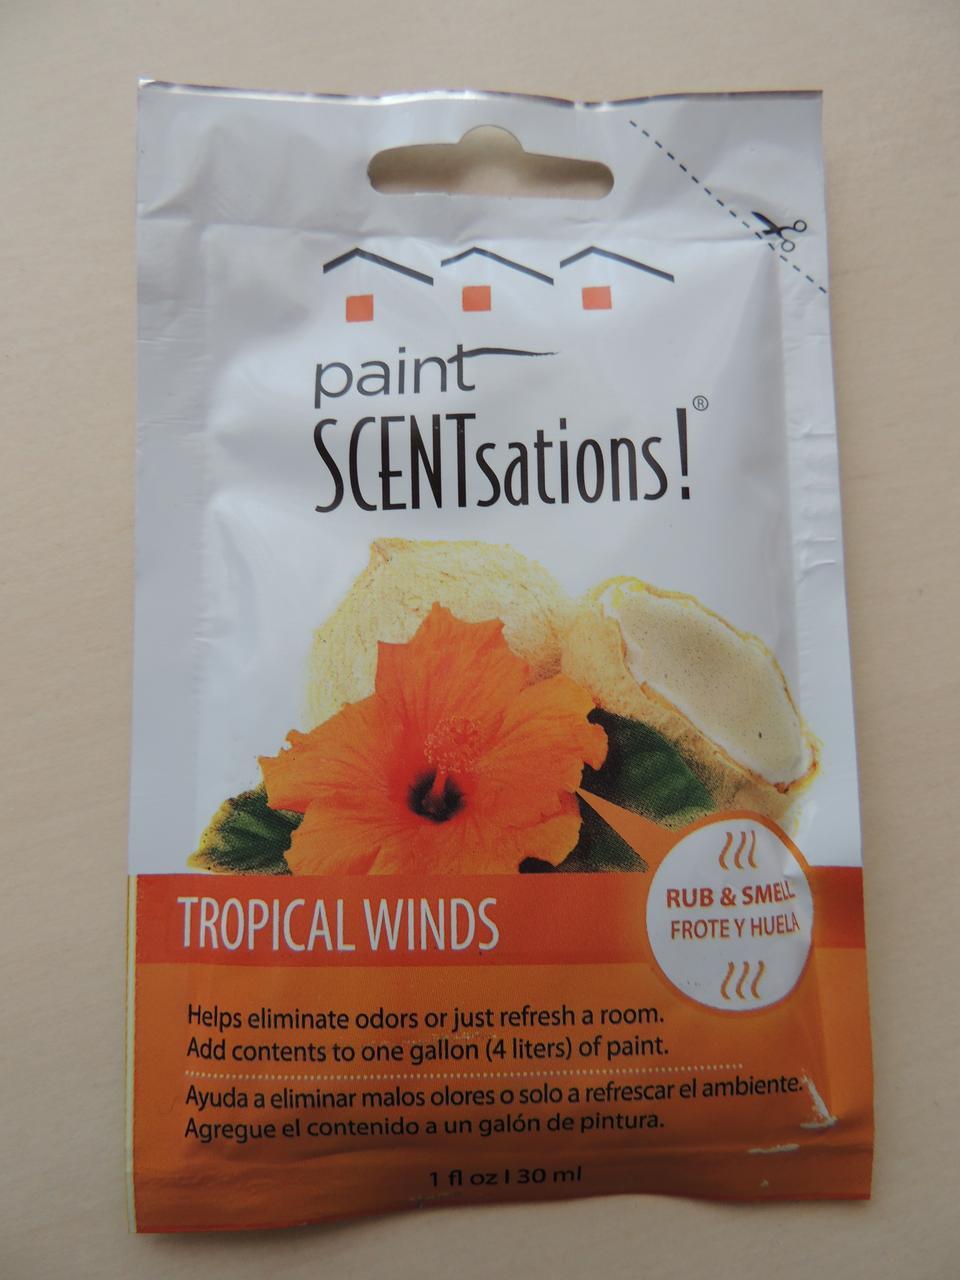 Paint SCENTsations ароматизована добавка до фарби Tropical Winds (Тропічний вітер)